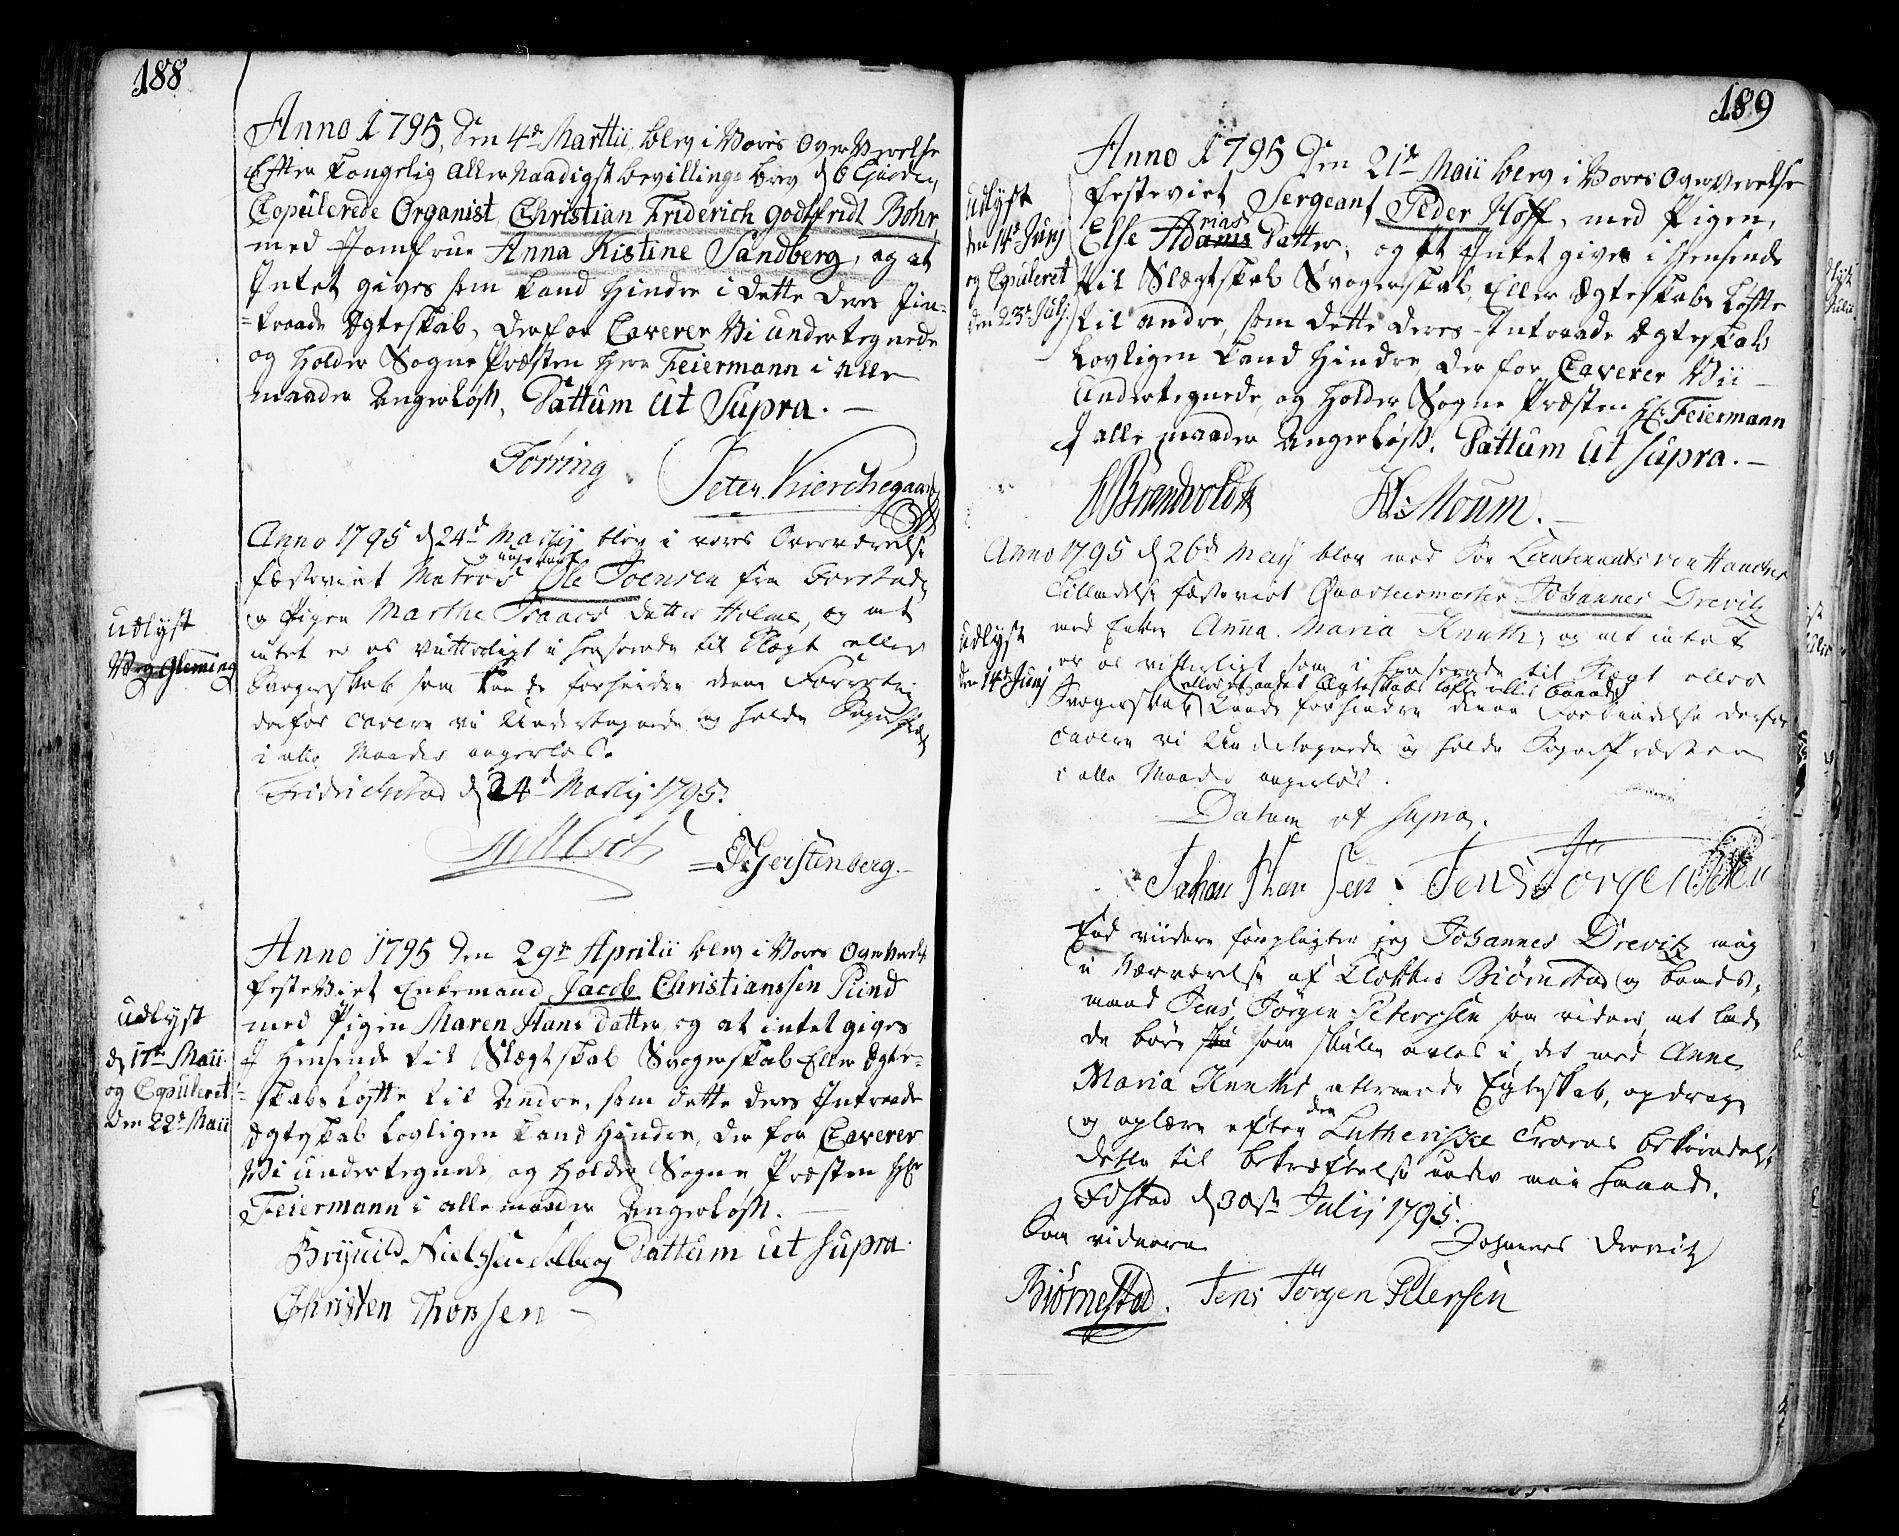 SAO, Fredrikstad prestekontor Kirkebøker, F/Fa/L0002: Ministerialbok nr. 2, 1750-1804, s. 188-189